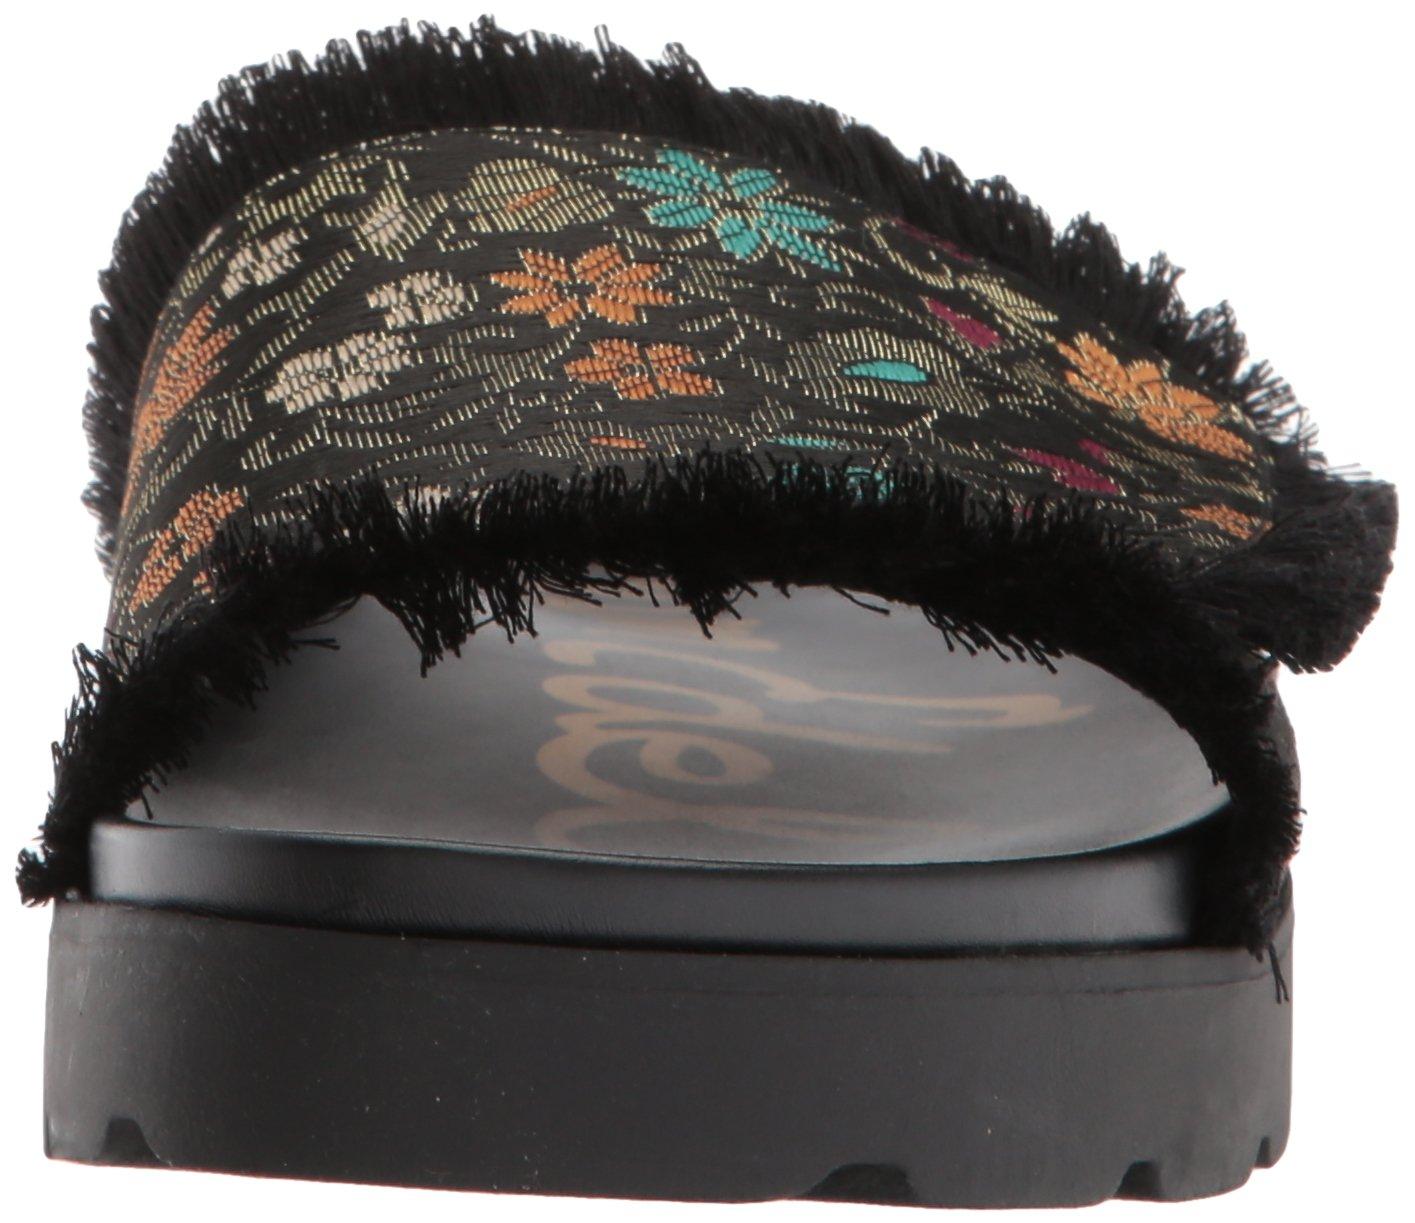 Sam Edelman B071Y5D59V Women's Mares Slide Sandal B071Y5D59V Edelman 10 B(M) US|Black Multi Floral Brocade 7ccb03